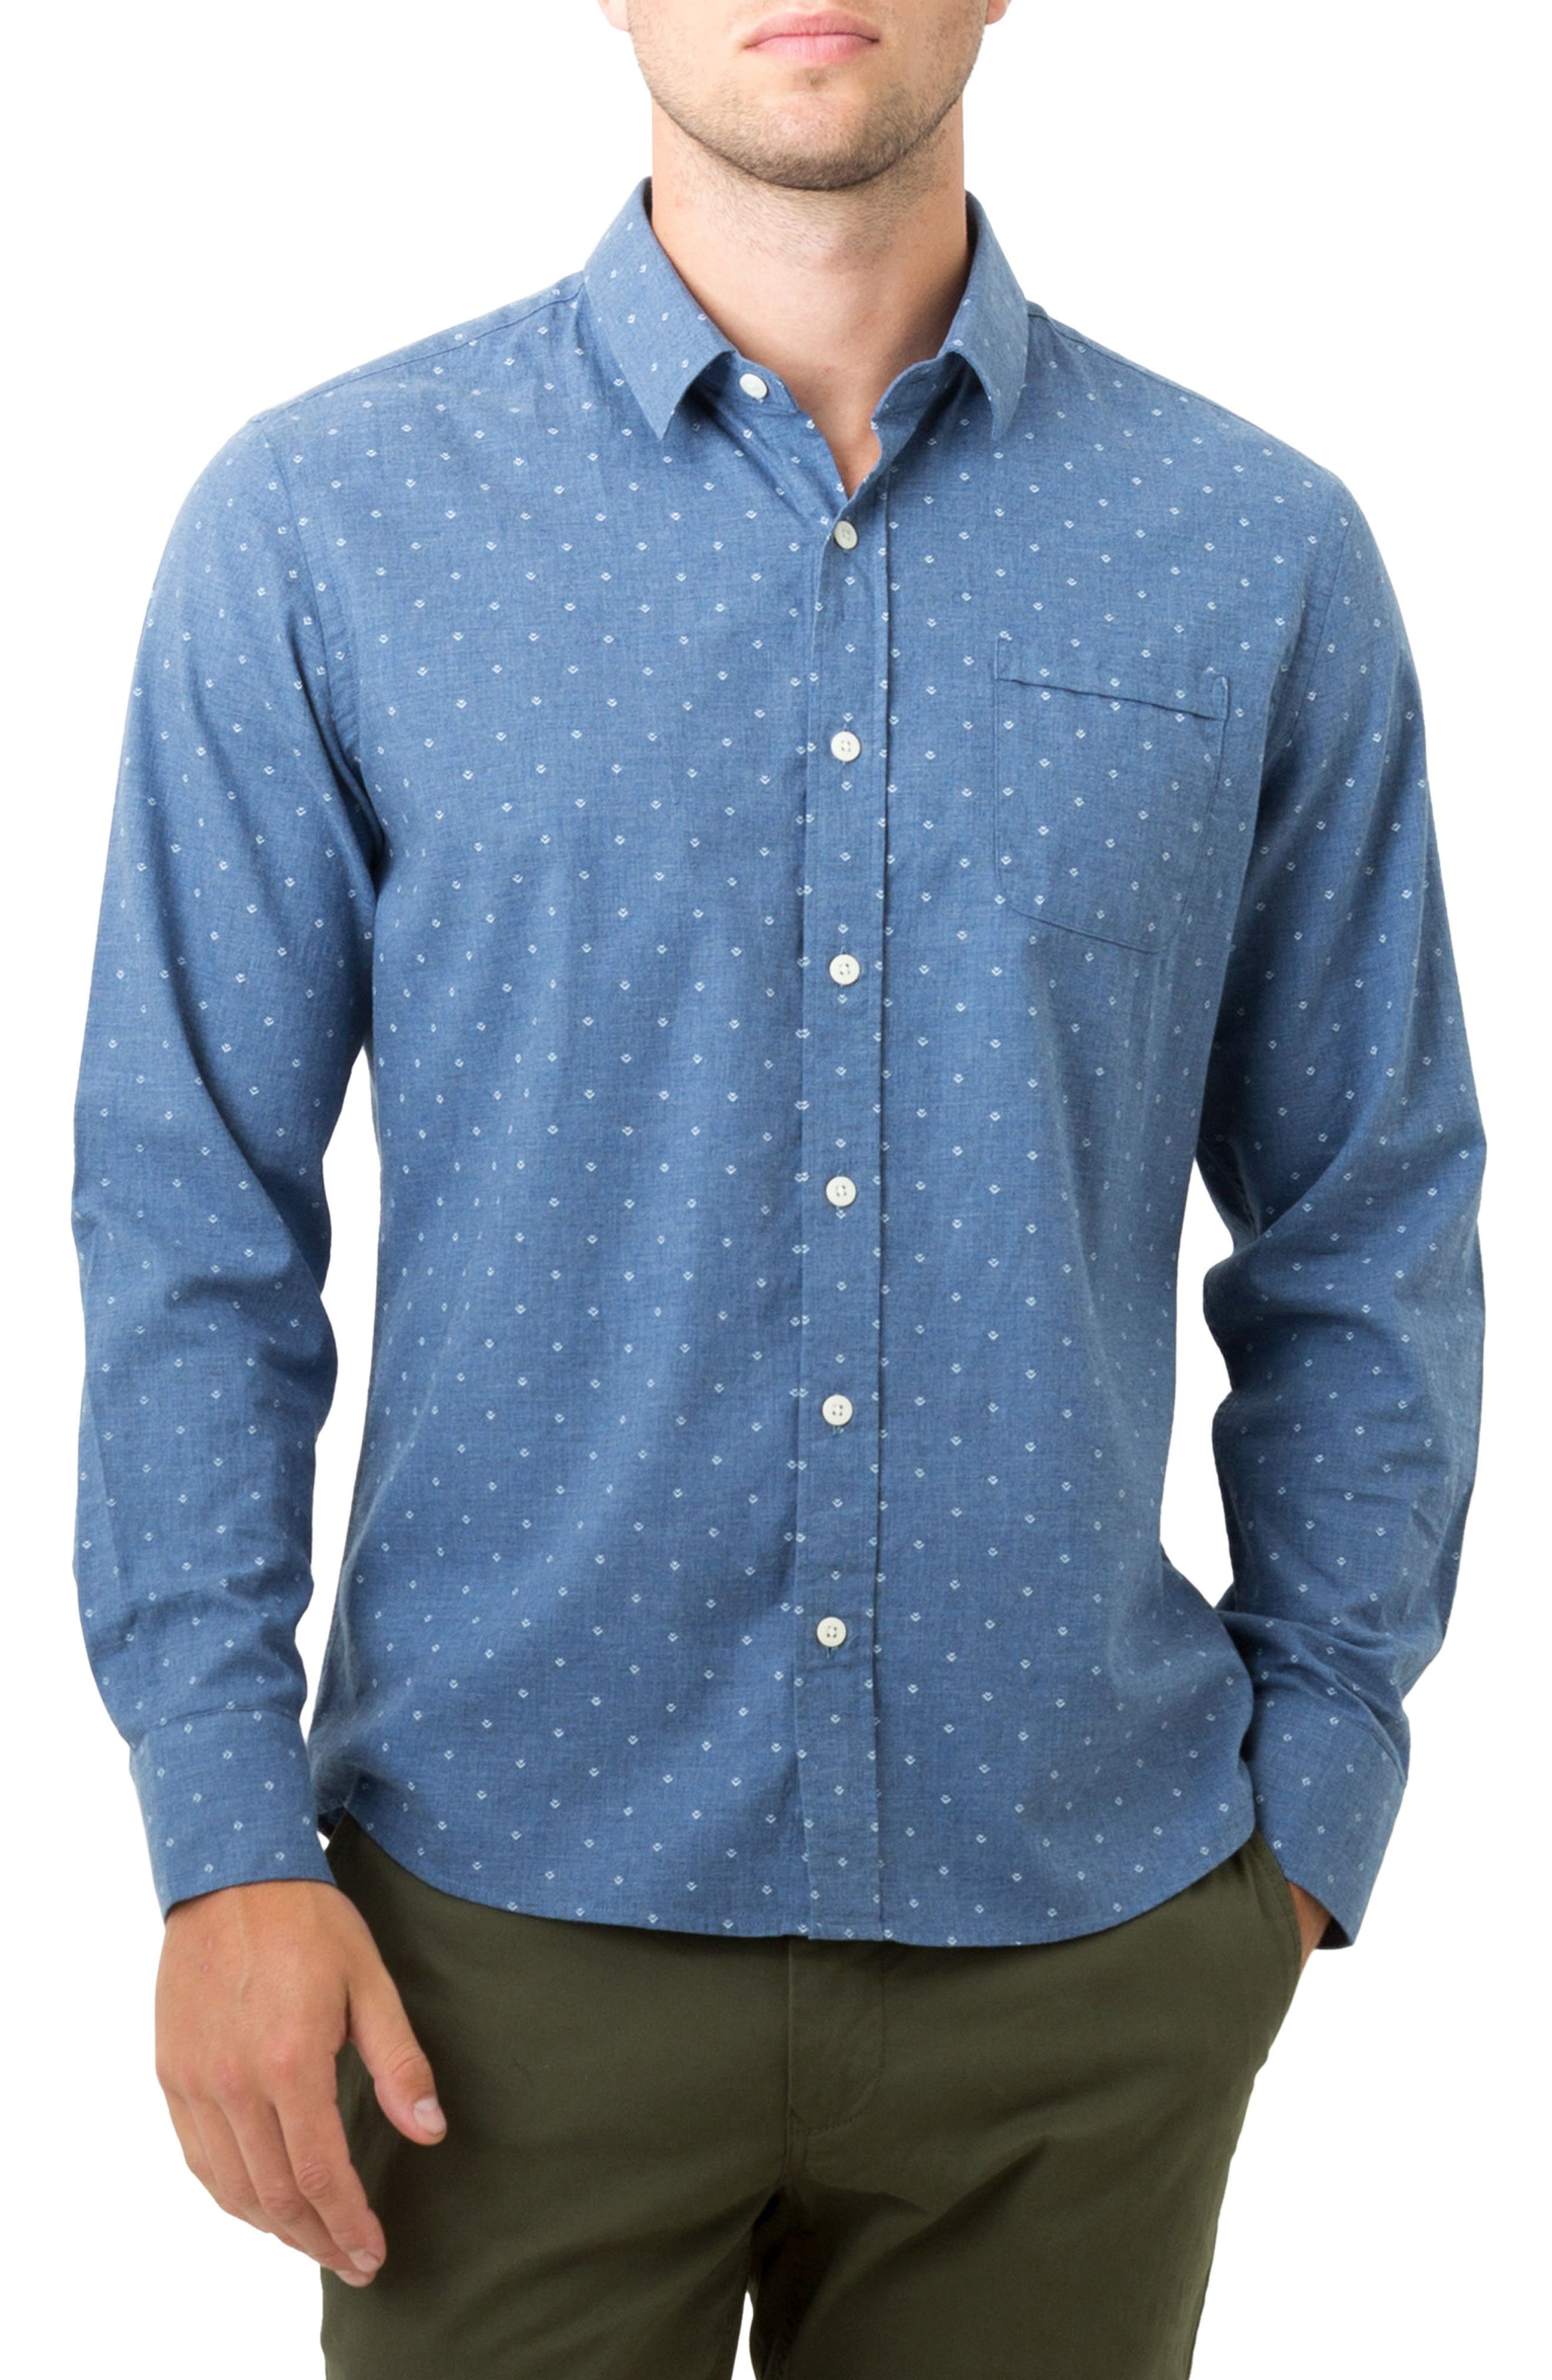 Madison Blues Woven Shirt,                             Main thumbnail 1, color,                             410